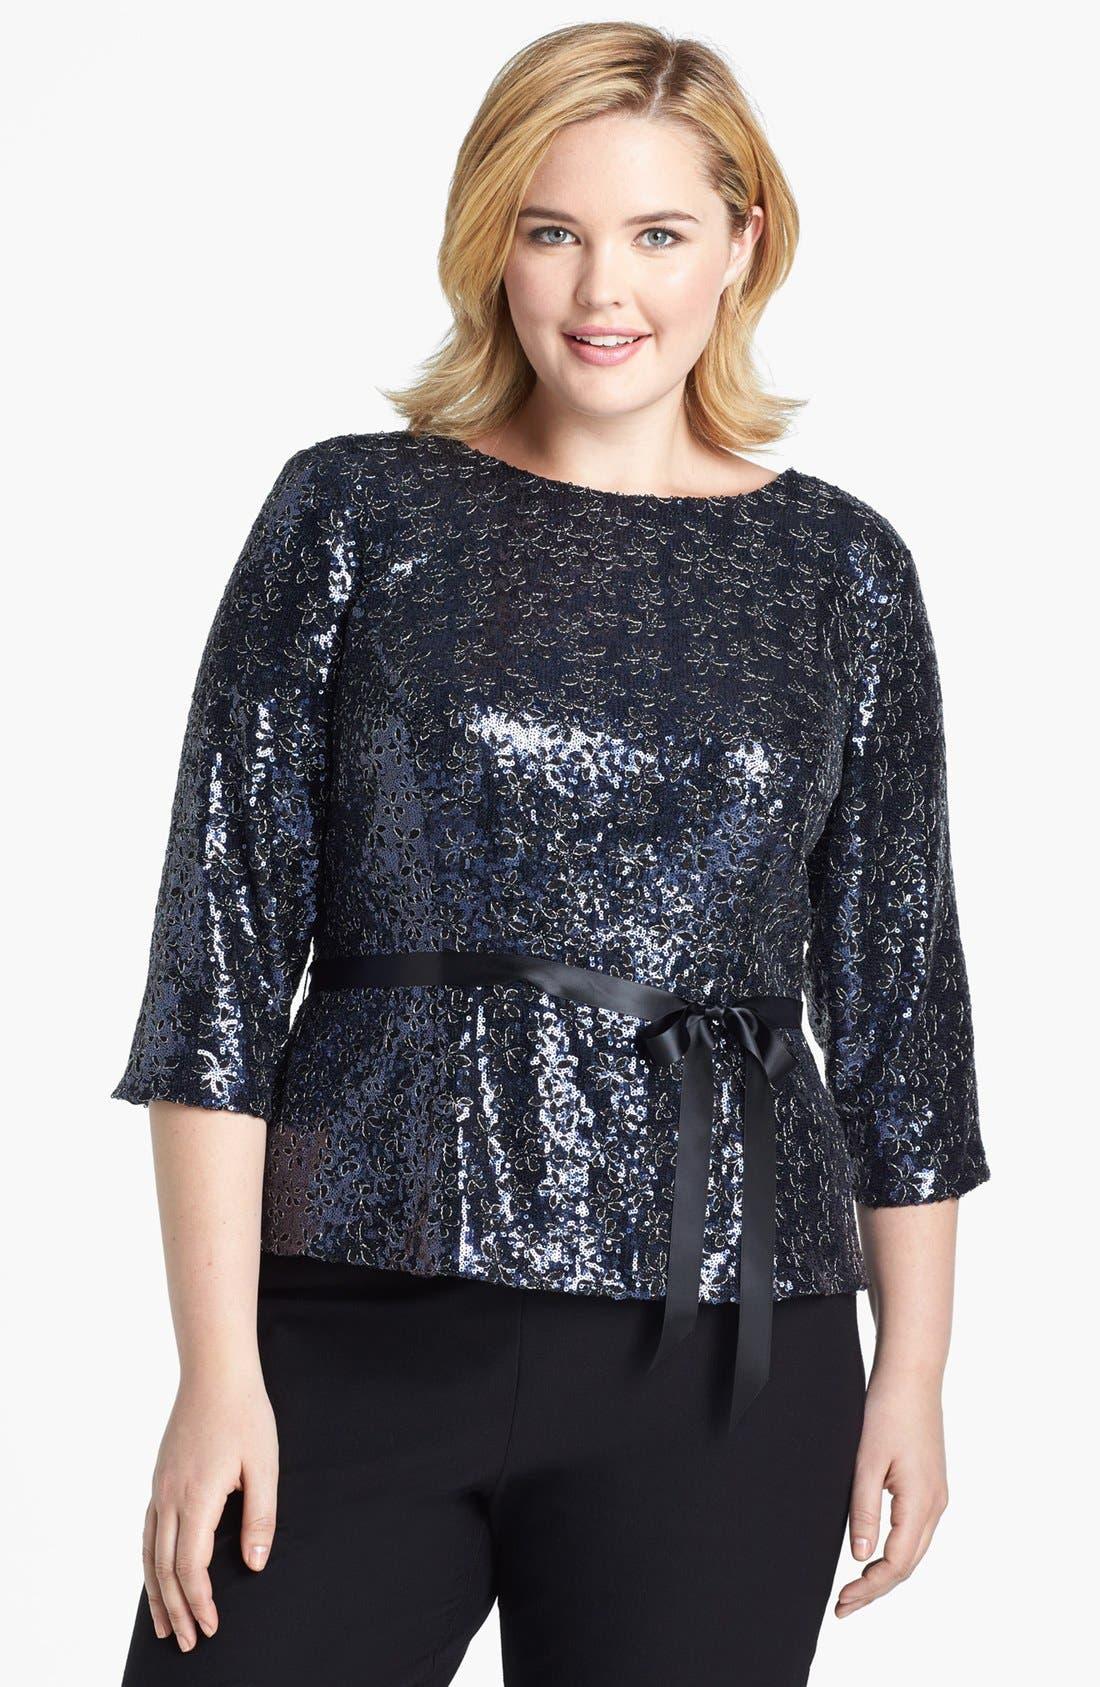 Alternate Image 1 Selected - Alex Evenings Sequin  Blouse (Plus Size)